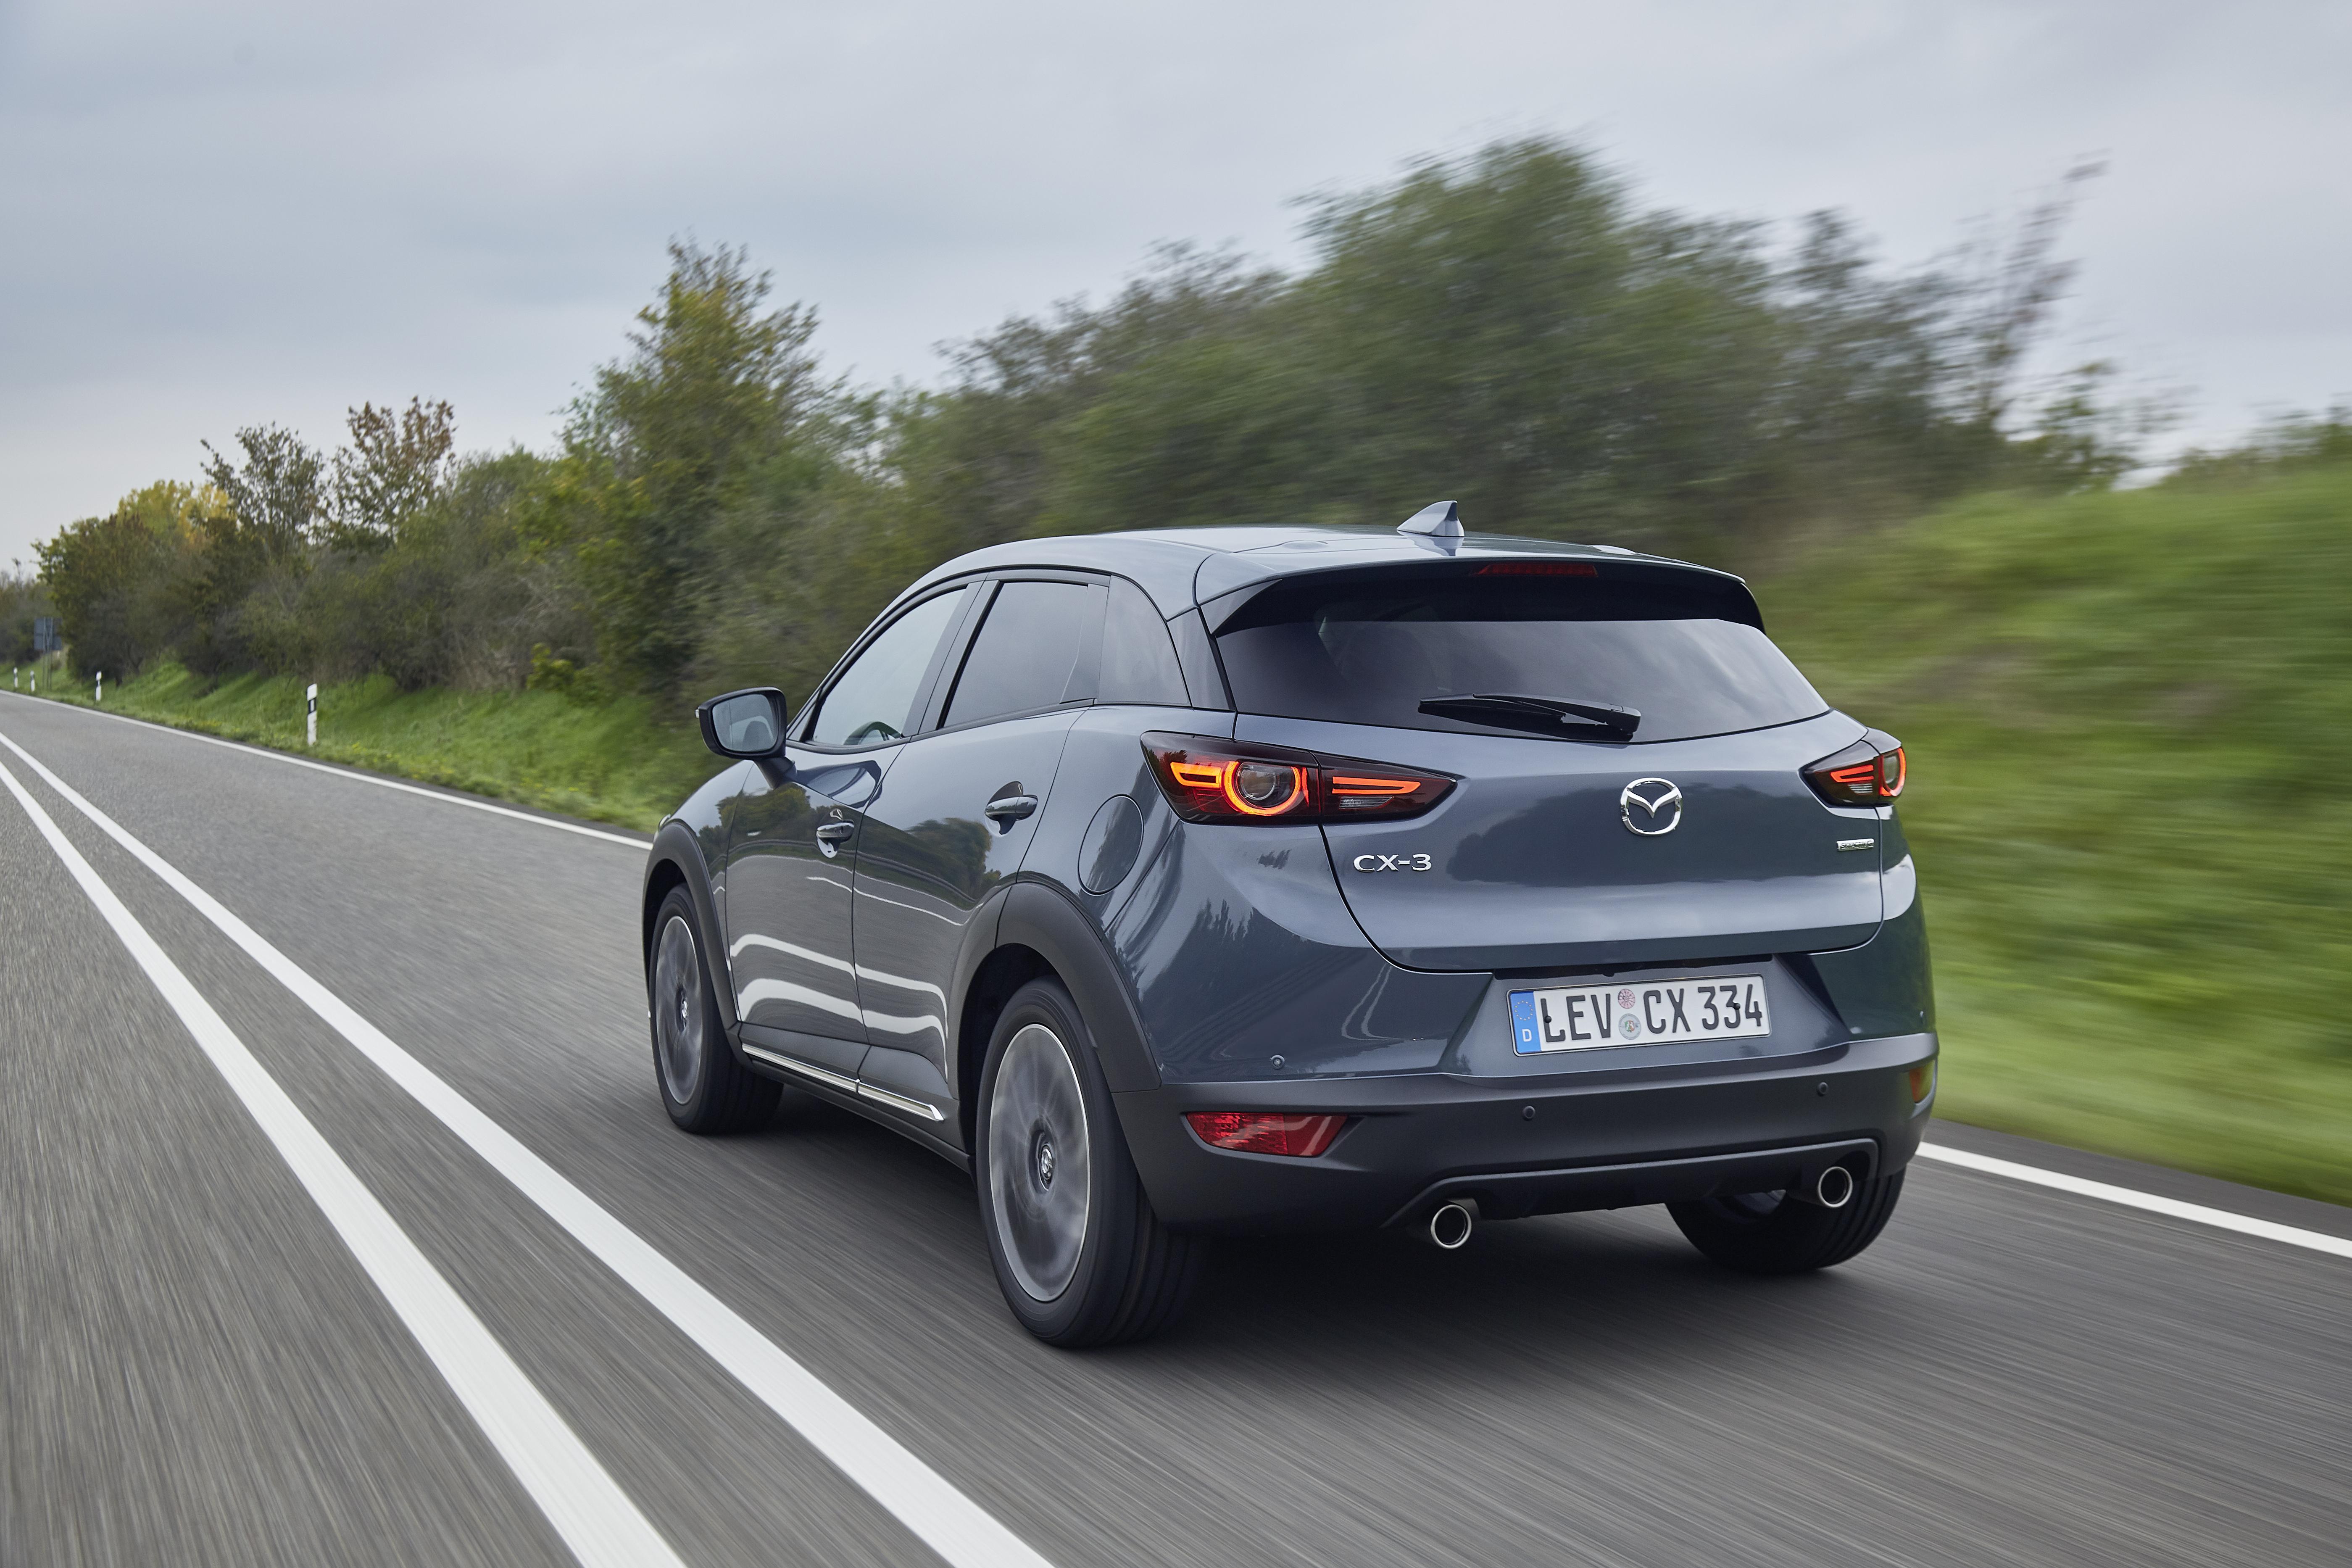 2021-Mazda-CX-3_Polymetal-Grey_Action-1